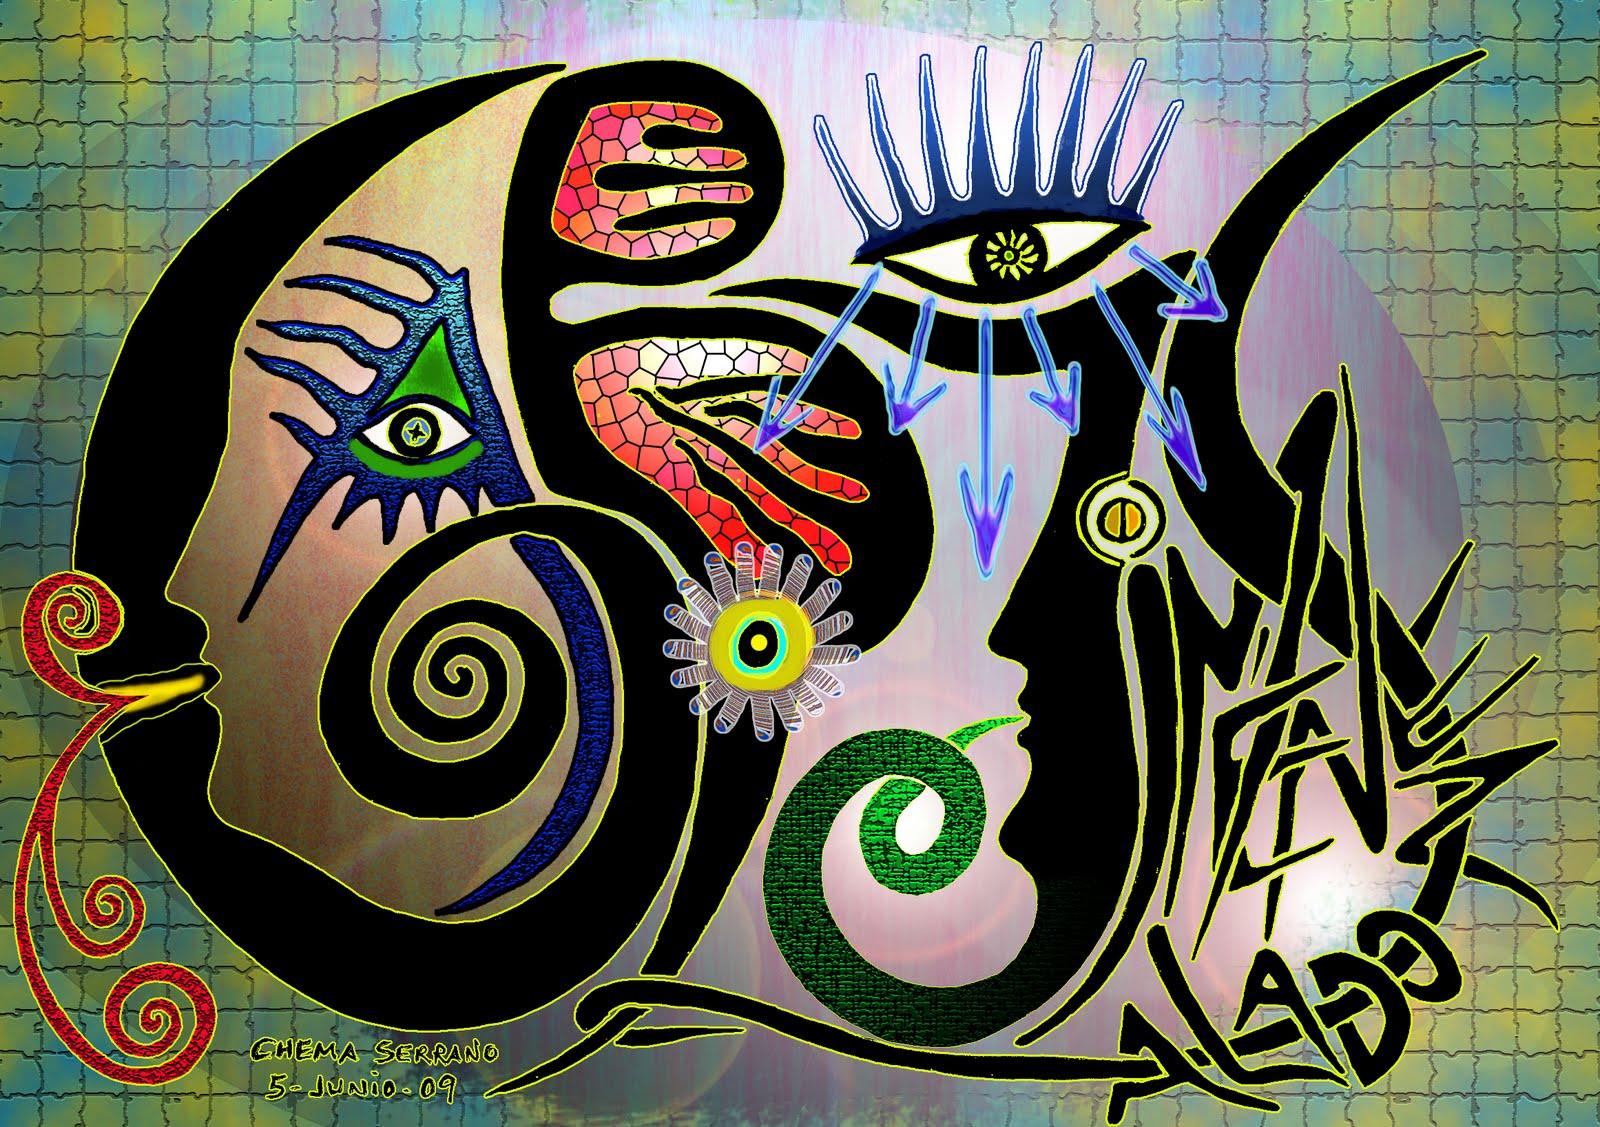 http://1.bp.blogspot.com/_C8dXe8hm14A/TKi3aQgp24I/AAAAAAAABZs/OhVayVfV5yI/s1600/dibujo+nombre-GABI+JIMENEZ+SALADO-color+copia.jpg